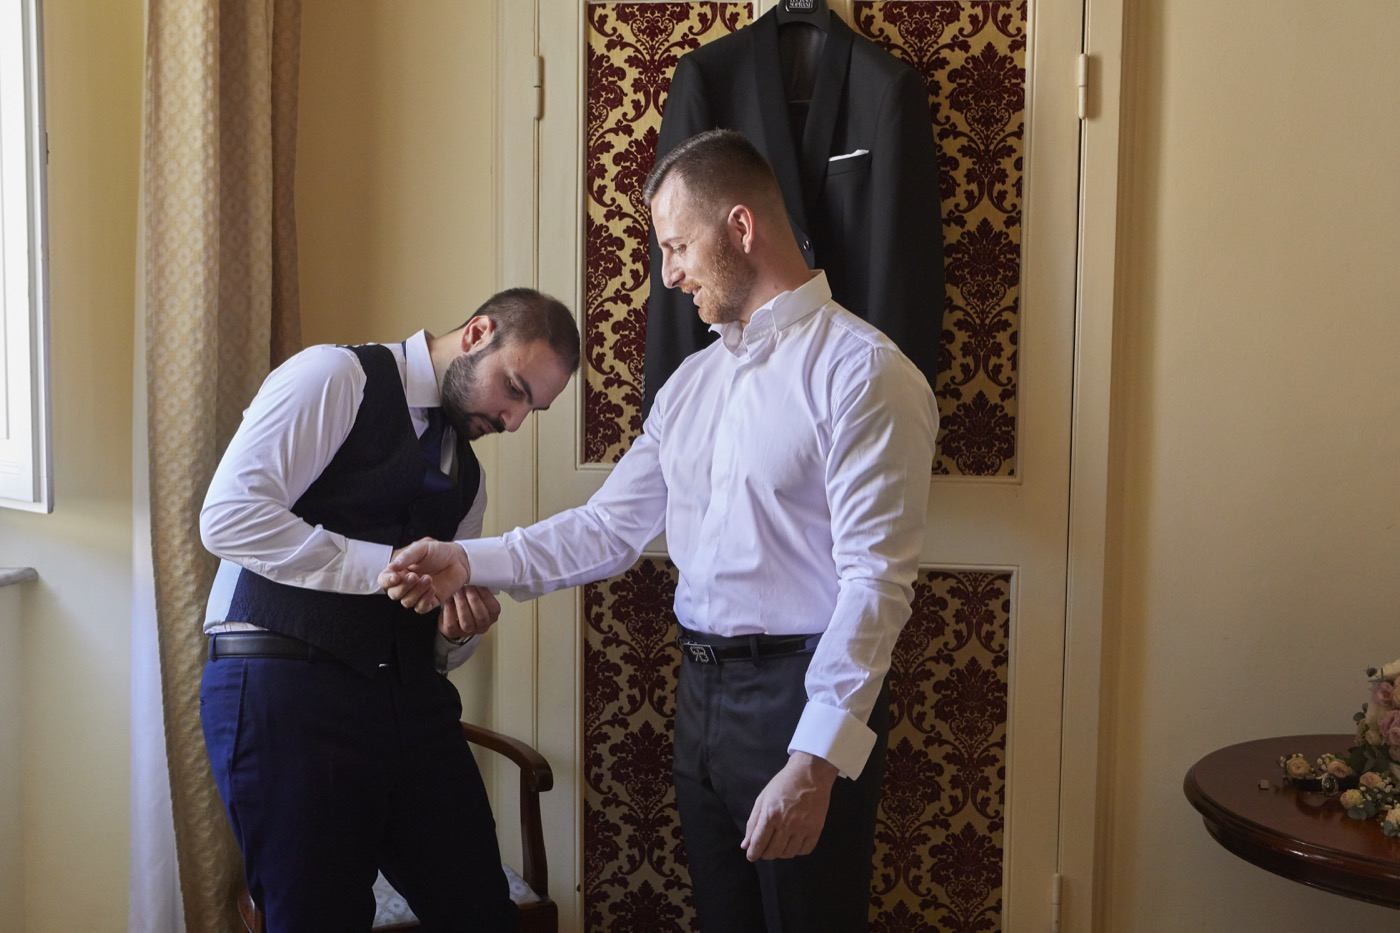 Claudio-Coppola-wedding-photographer-la-scuderia-eventi-preparativi-la-rosetta-perugia-6